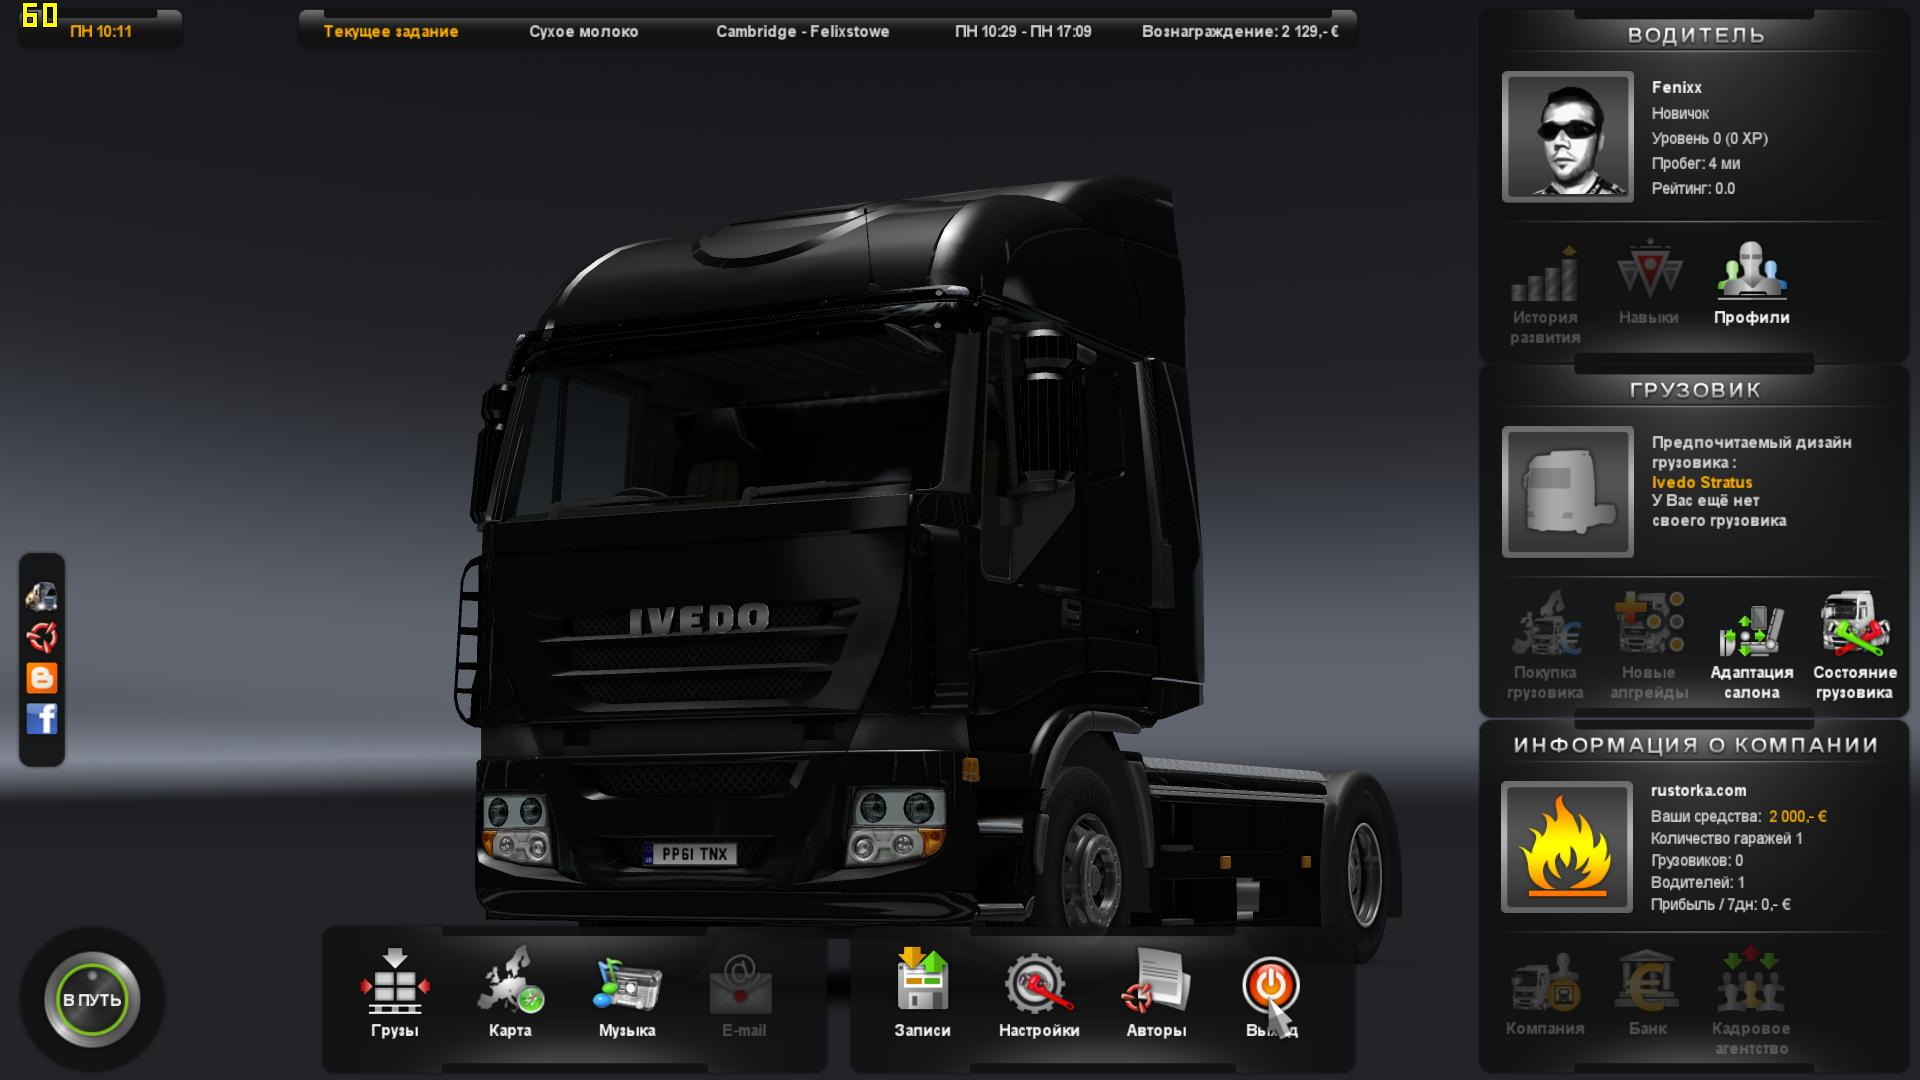 Euro truck simulator 2 coronerlemurmodpack (2018) pc | mod.